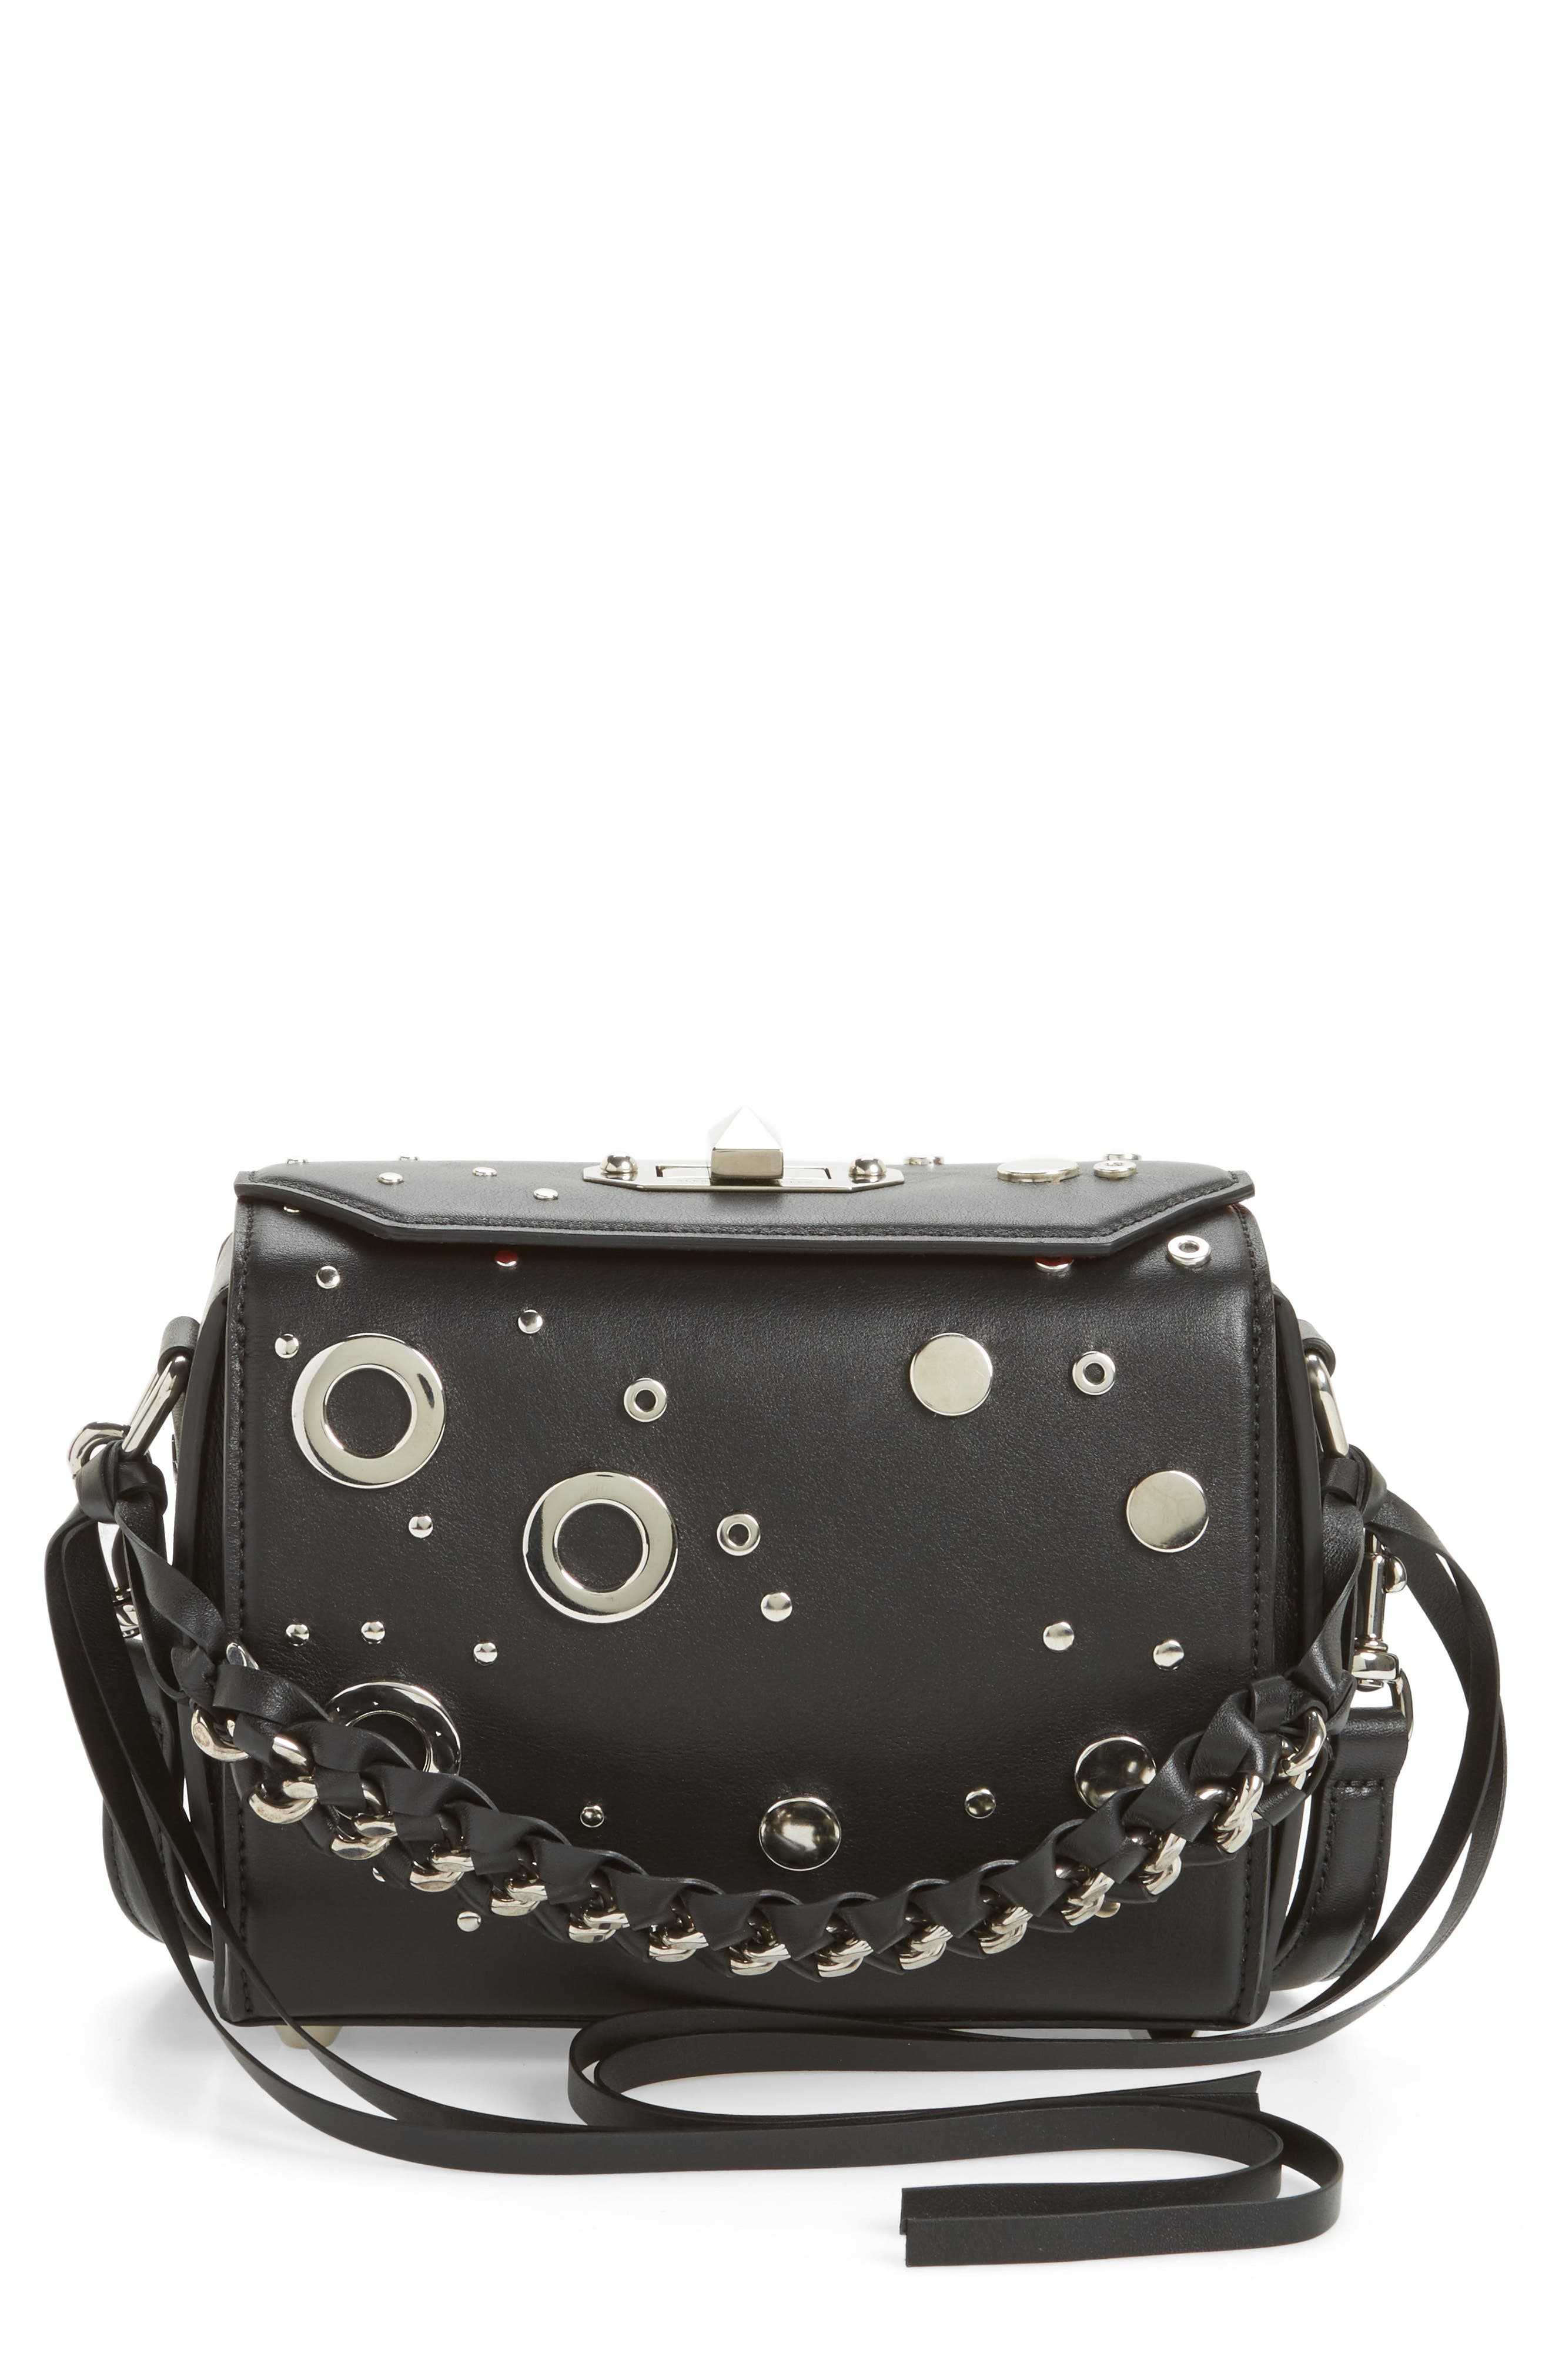 Alternate Image 1 Selected - Alexander McQueen Grommet & Stud Calfskin Leather Box Bag